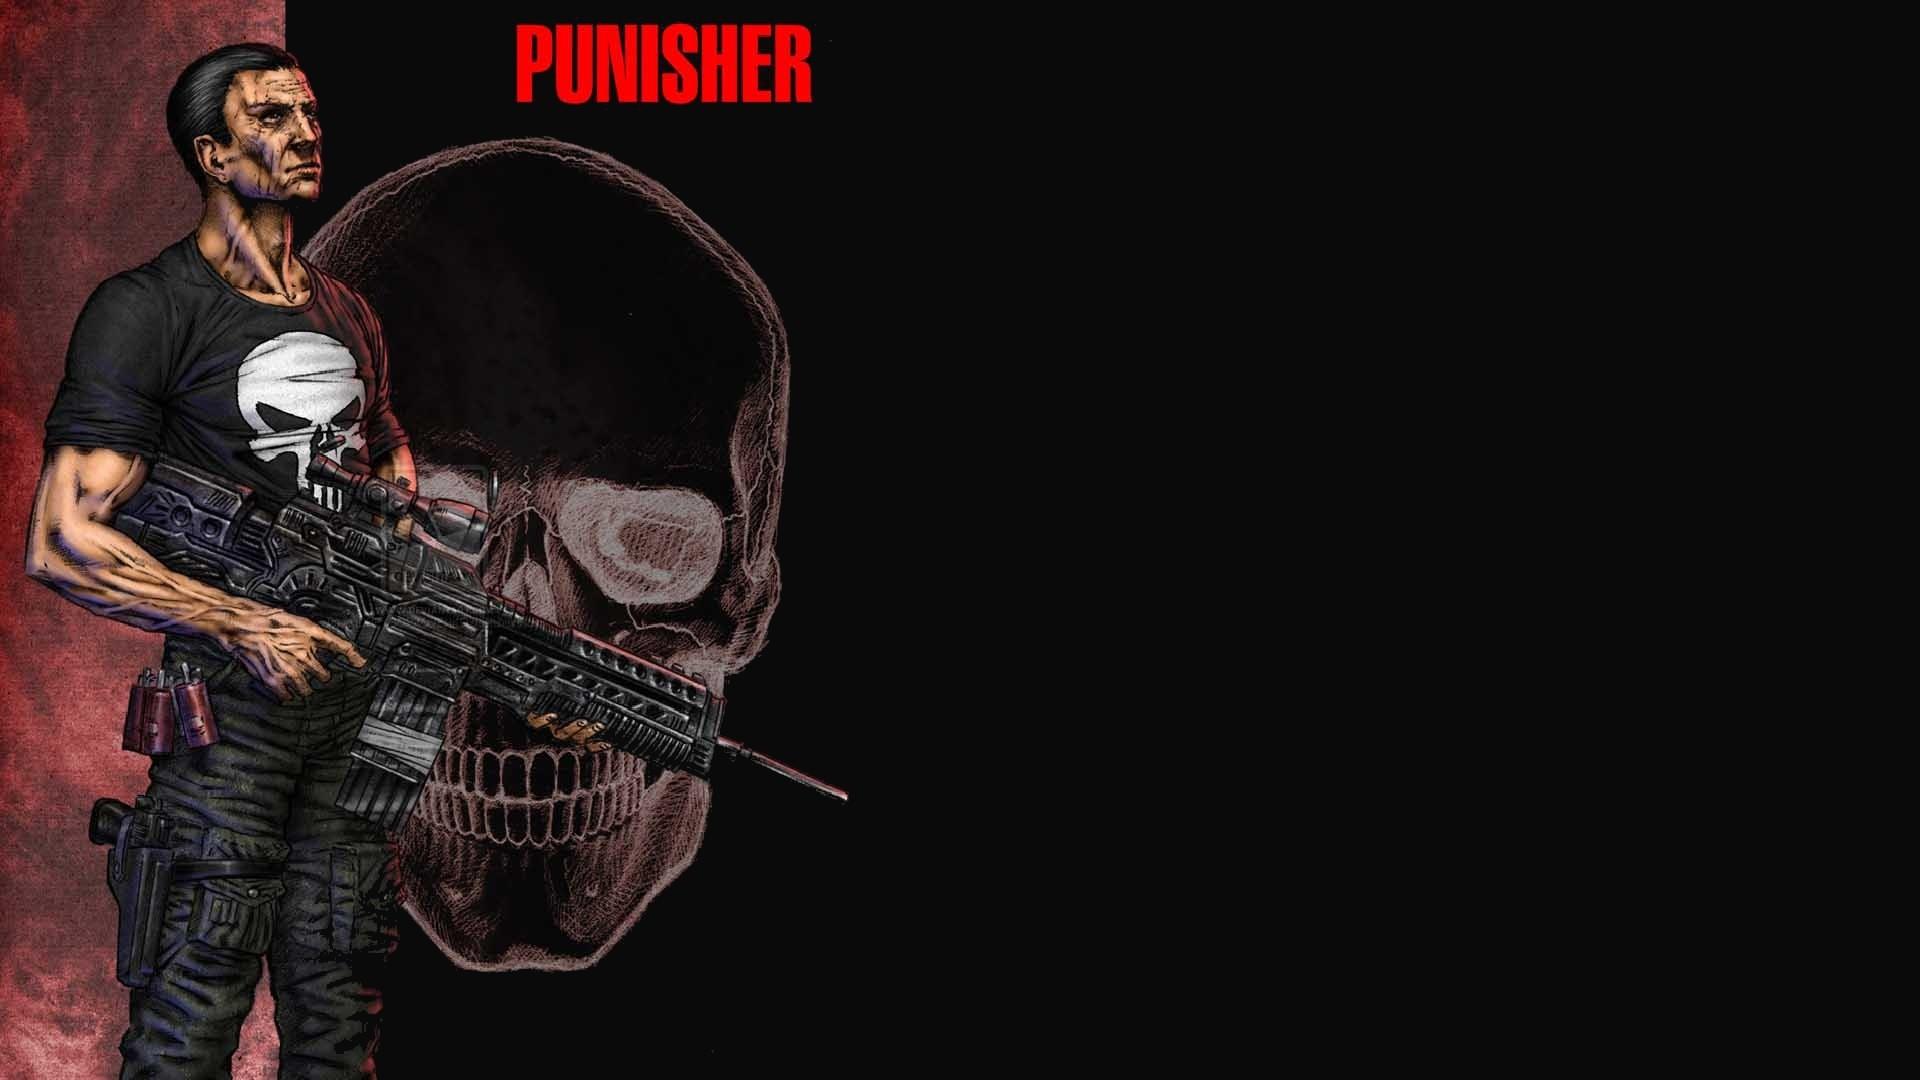 the punisher wallpaper free the punisher desktop wallpaper download .